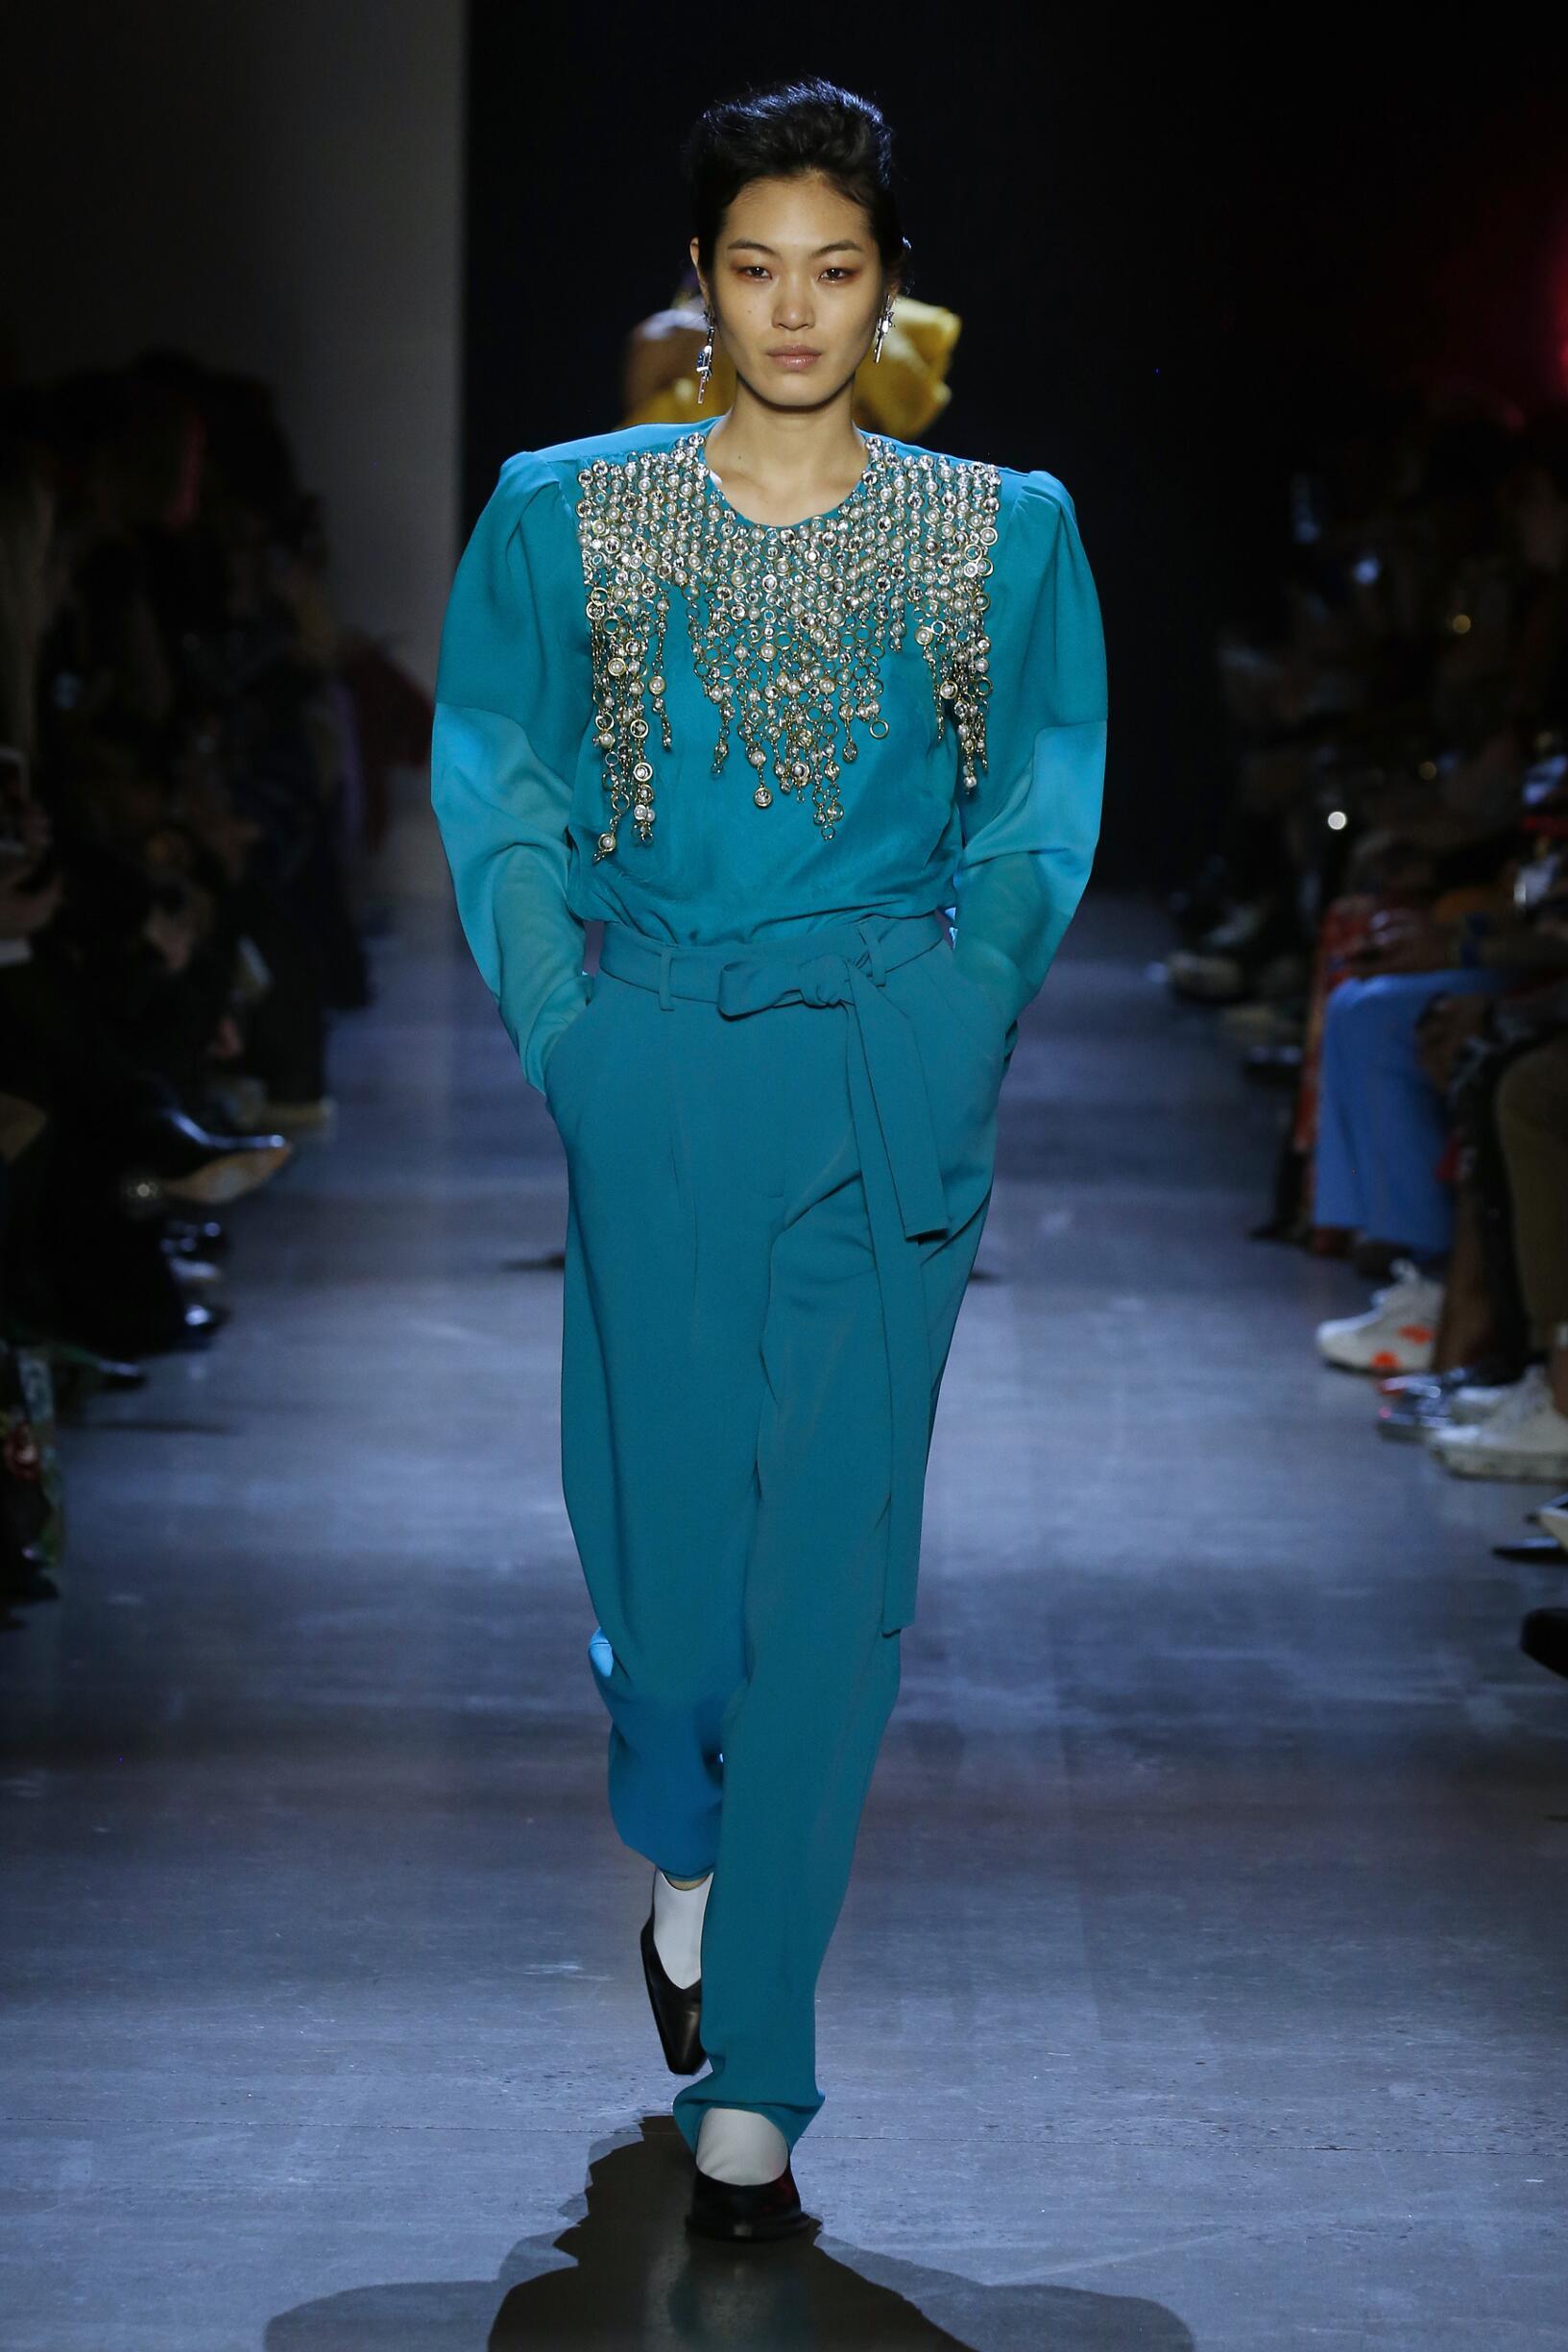 Woman FW 2019 Prabal Gurung Show New York Fashion Week